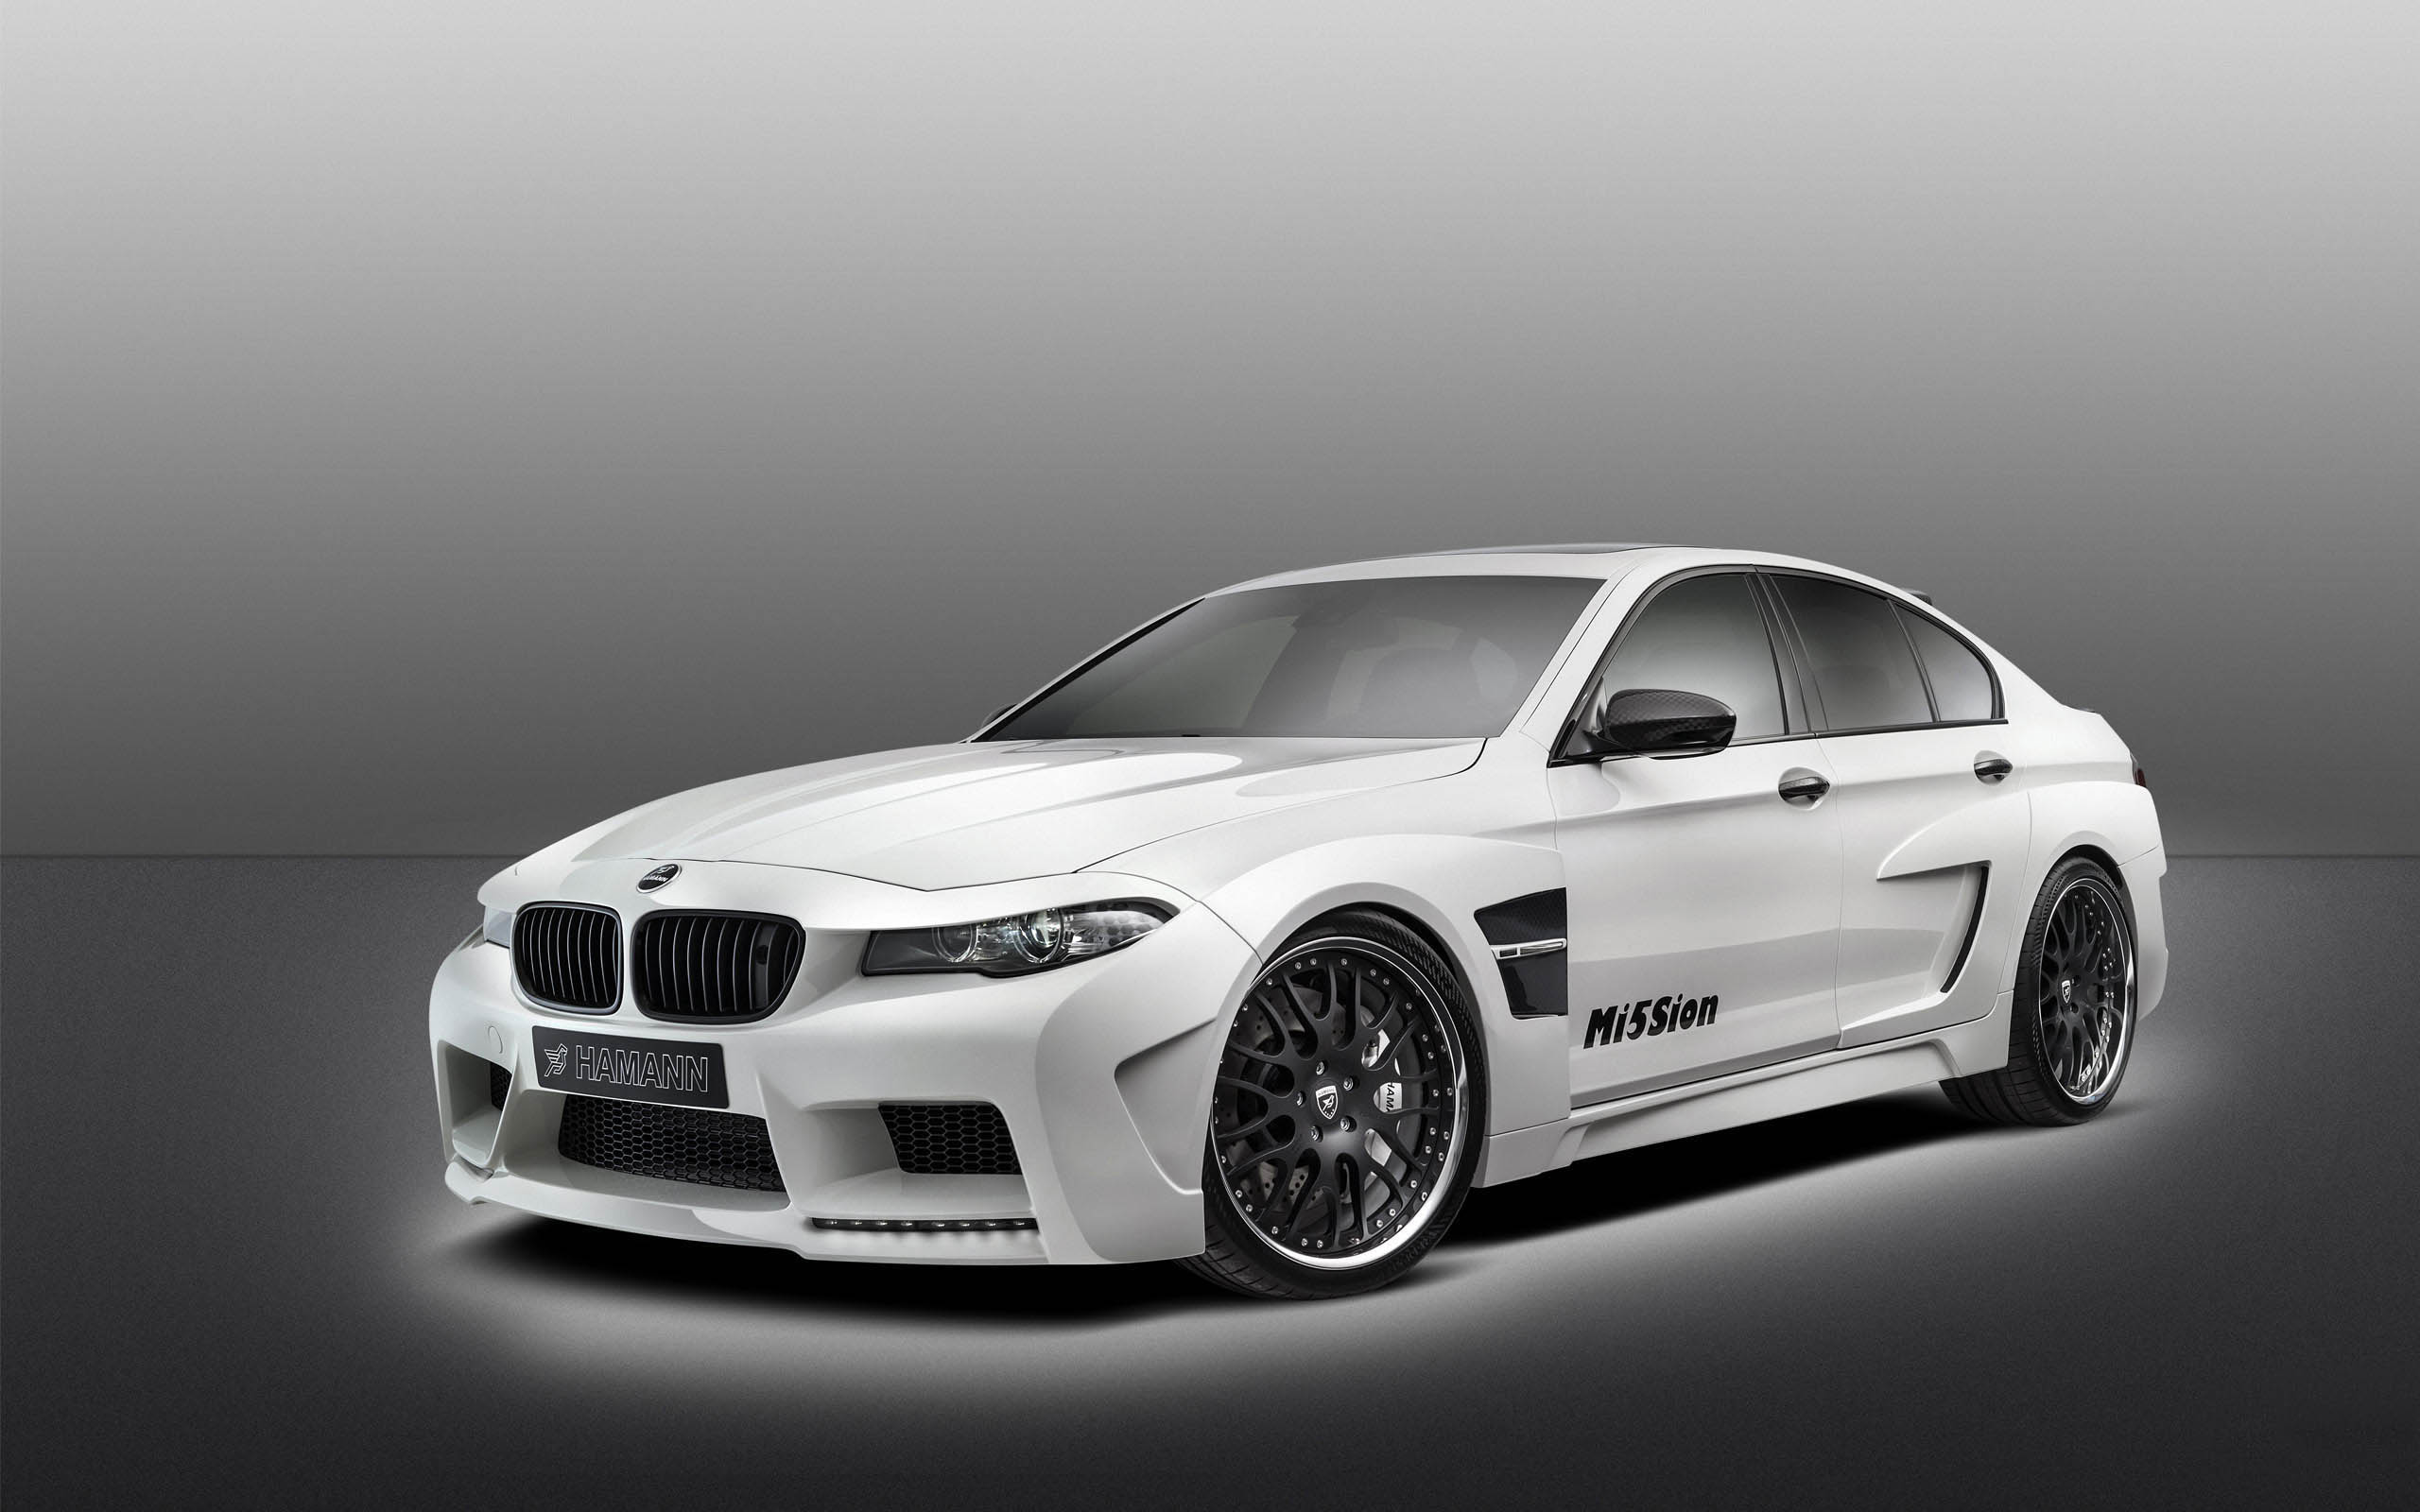 BMW m5 luxurious car wallpaper in HD 2560x1600